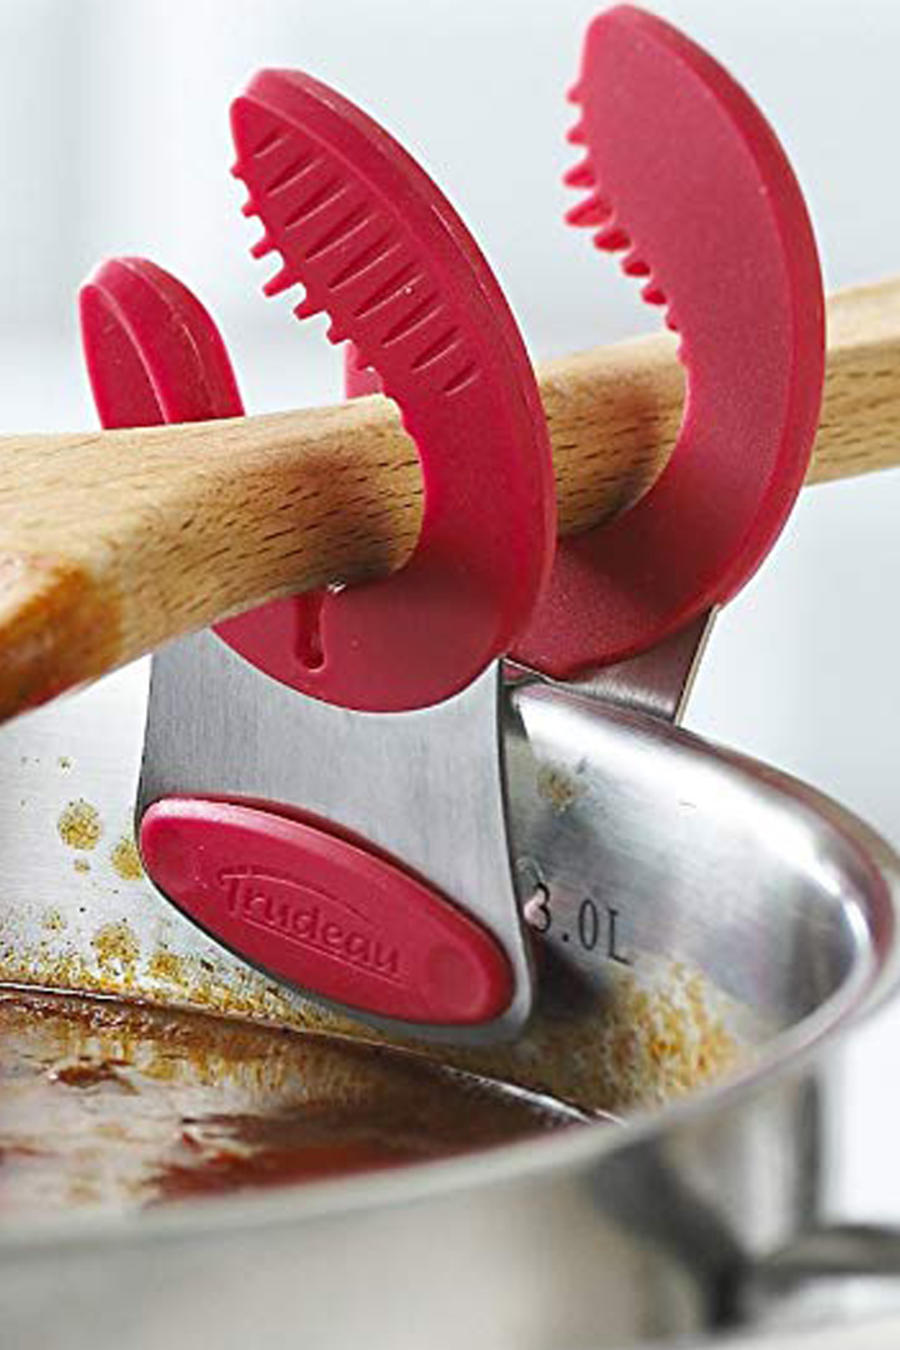 Genius Kitchen Products Under $10 That Actually Work